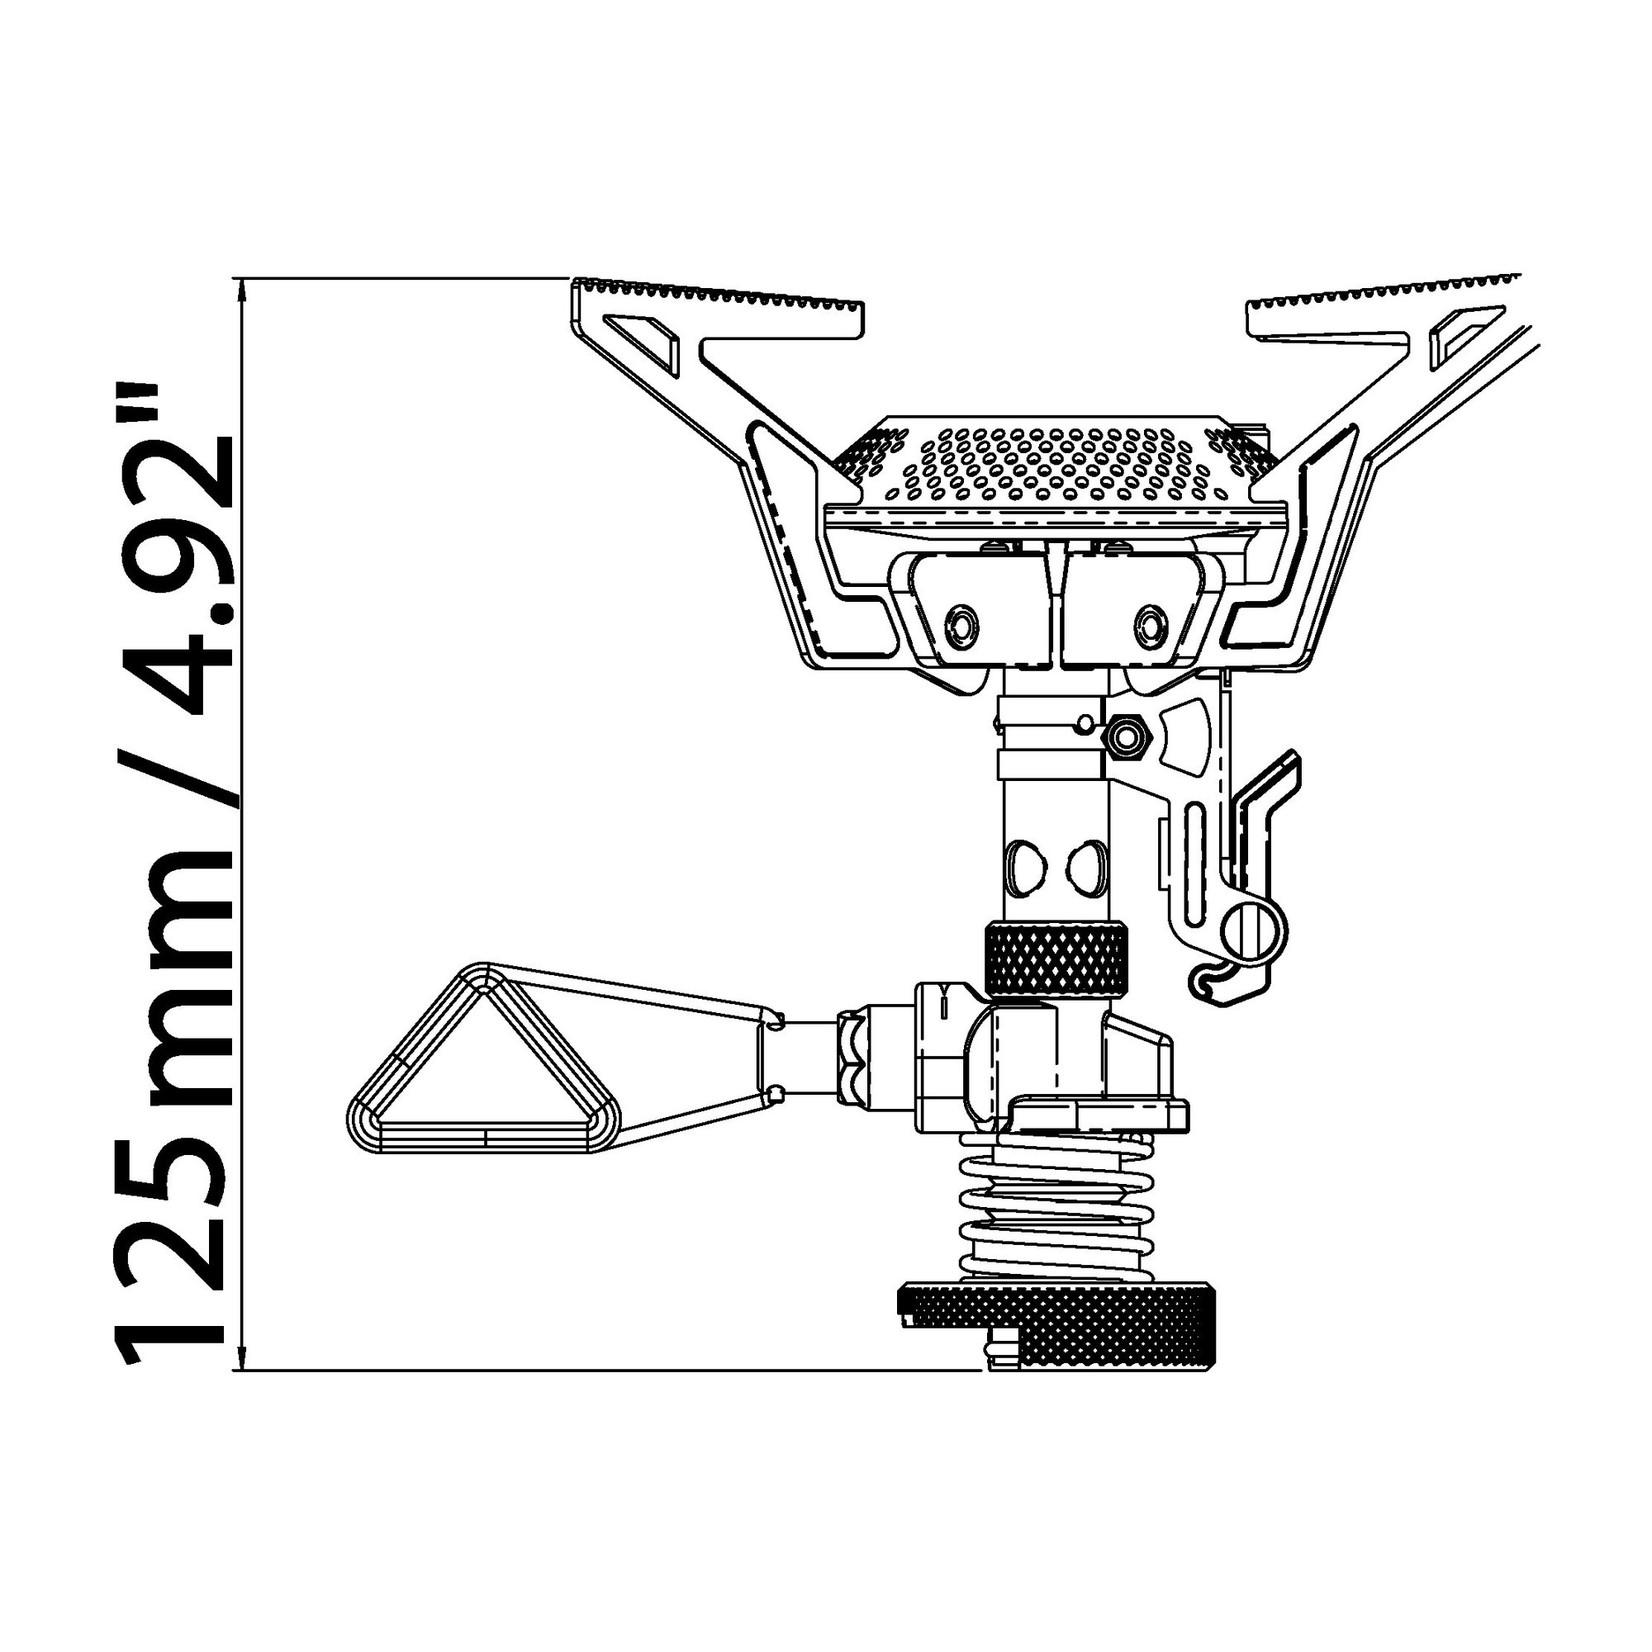 Primus Primus PowerTrail outdoorbrander piezo regulator duo, compact